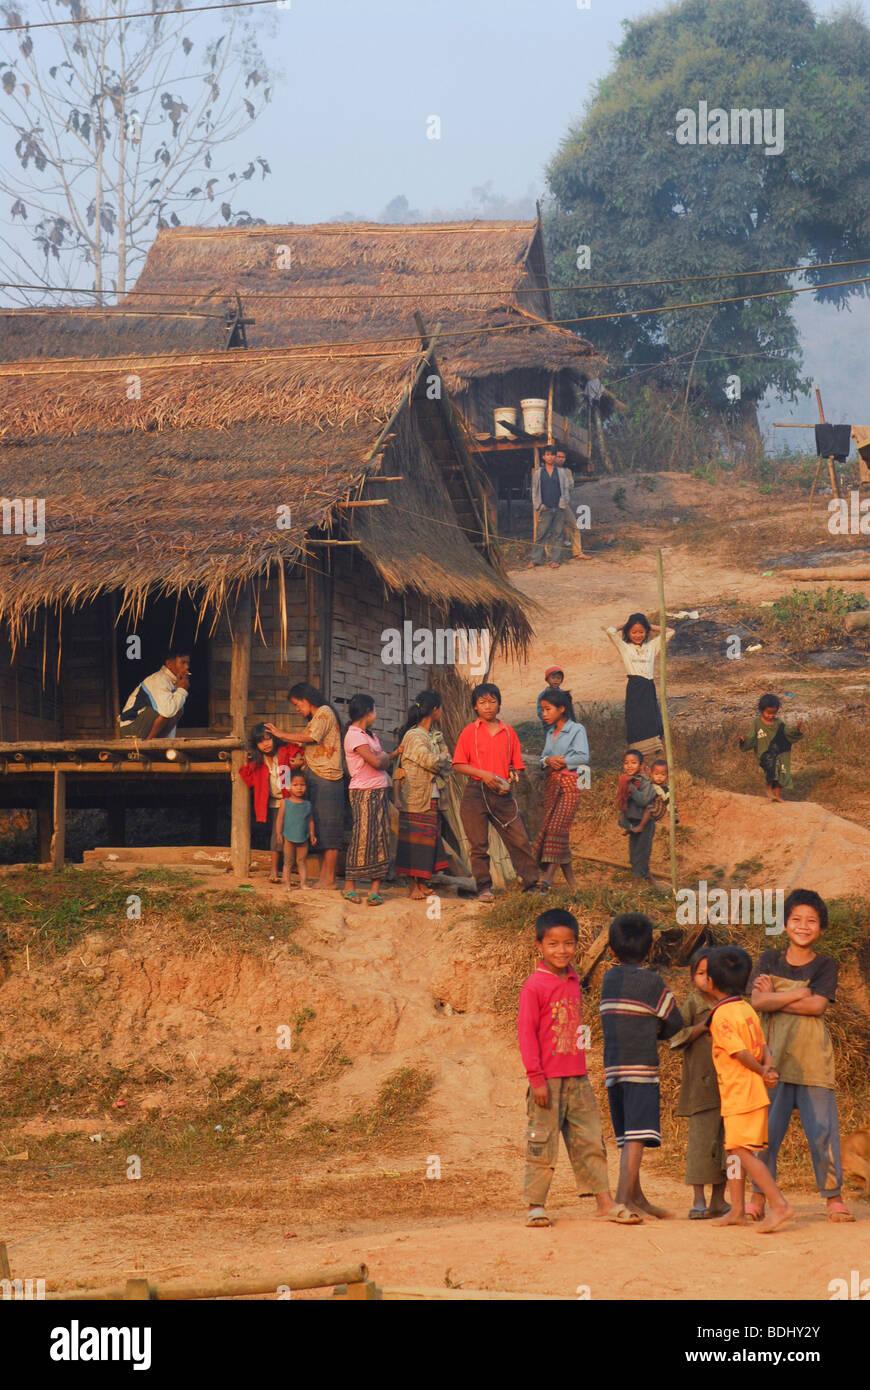 Hmong ethnic minority hill tribe village, Northern Laos - Stock Image